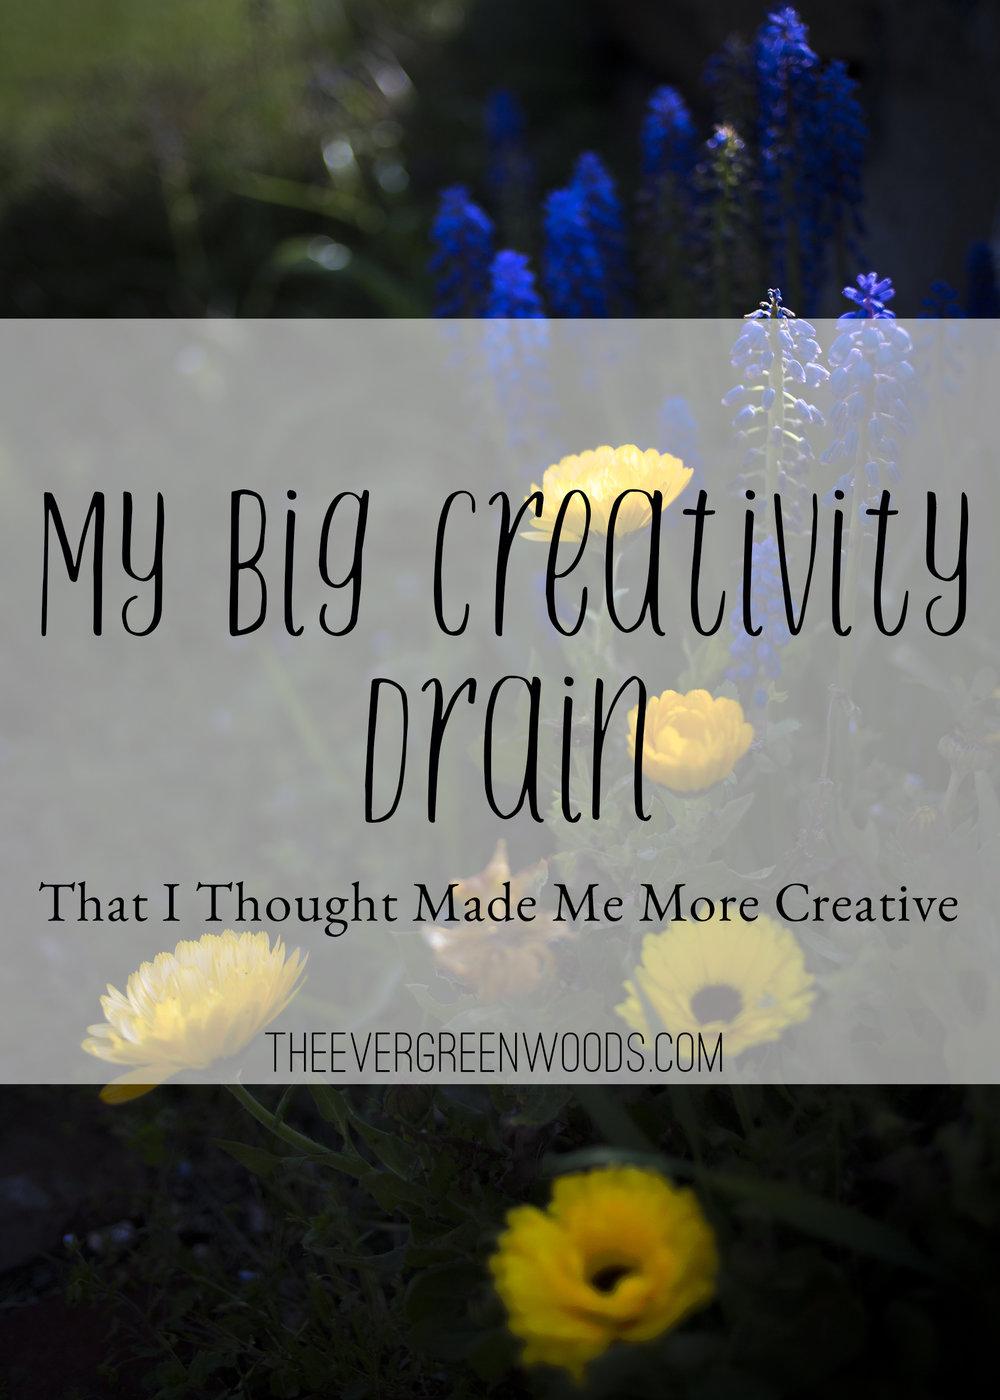 Creativity Drain.jpg